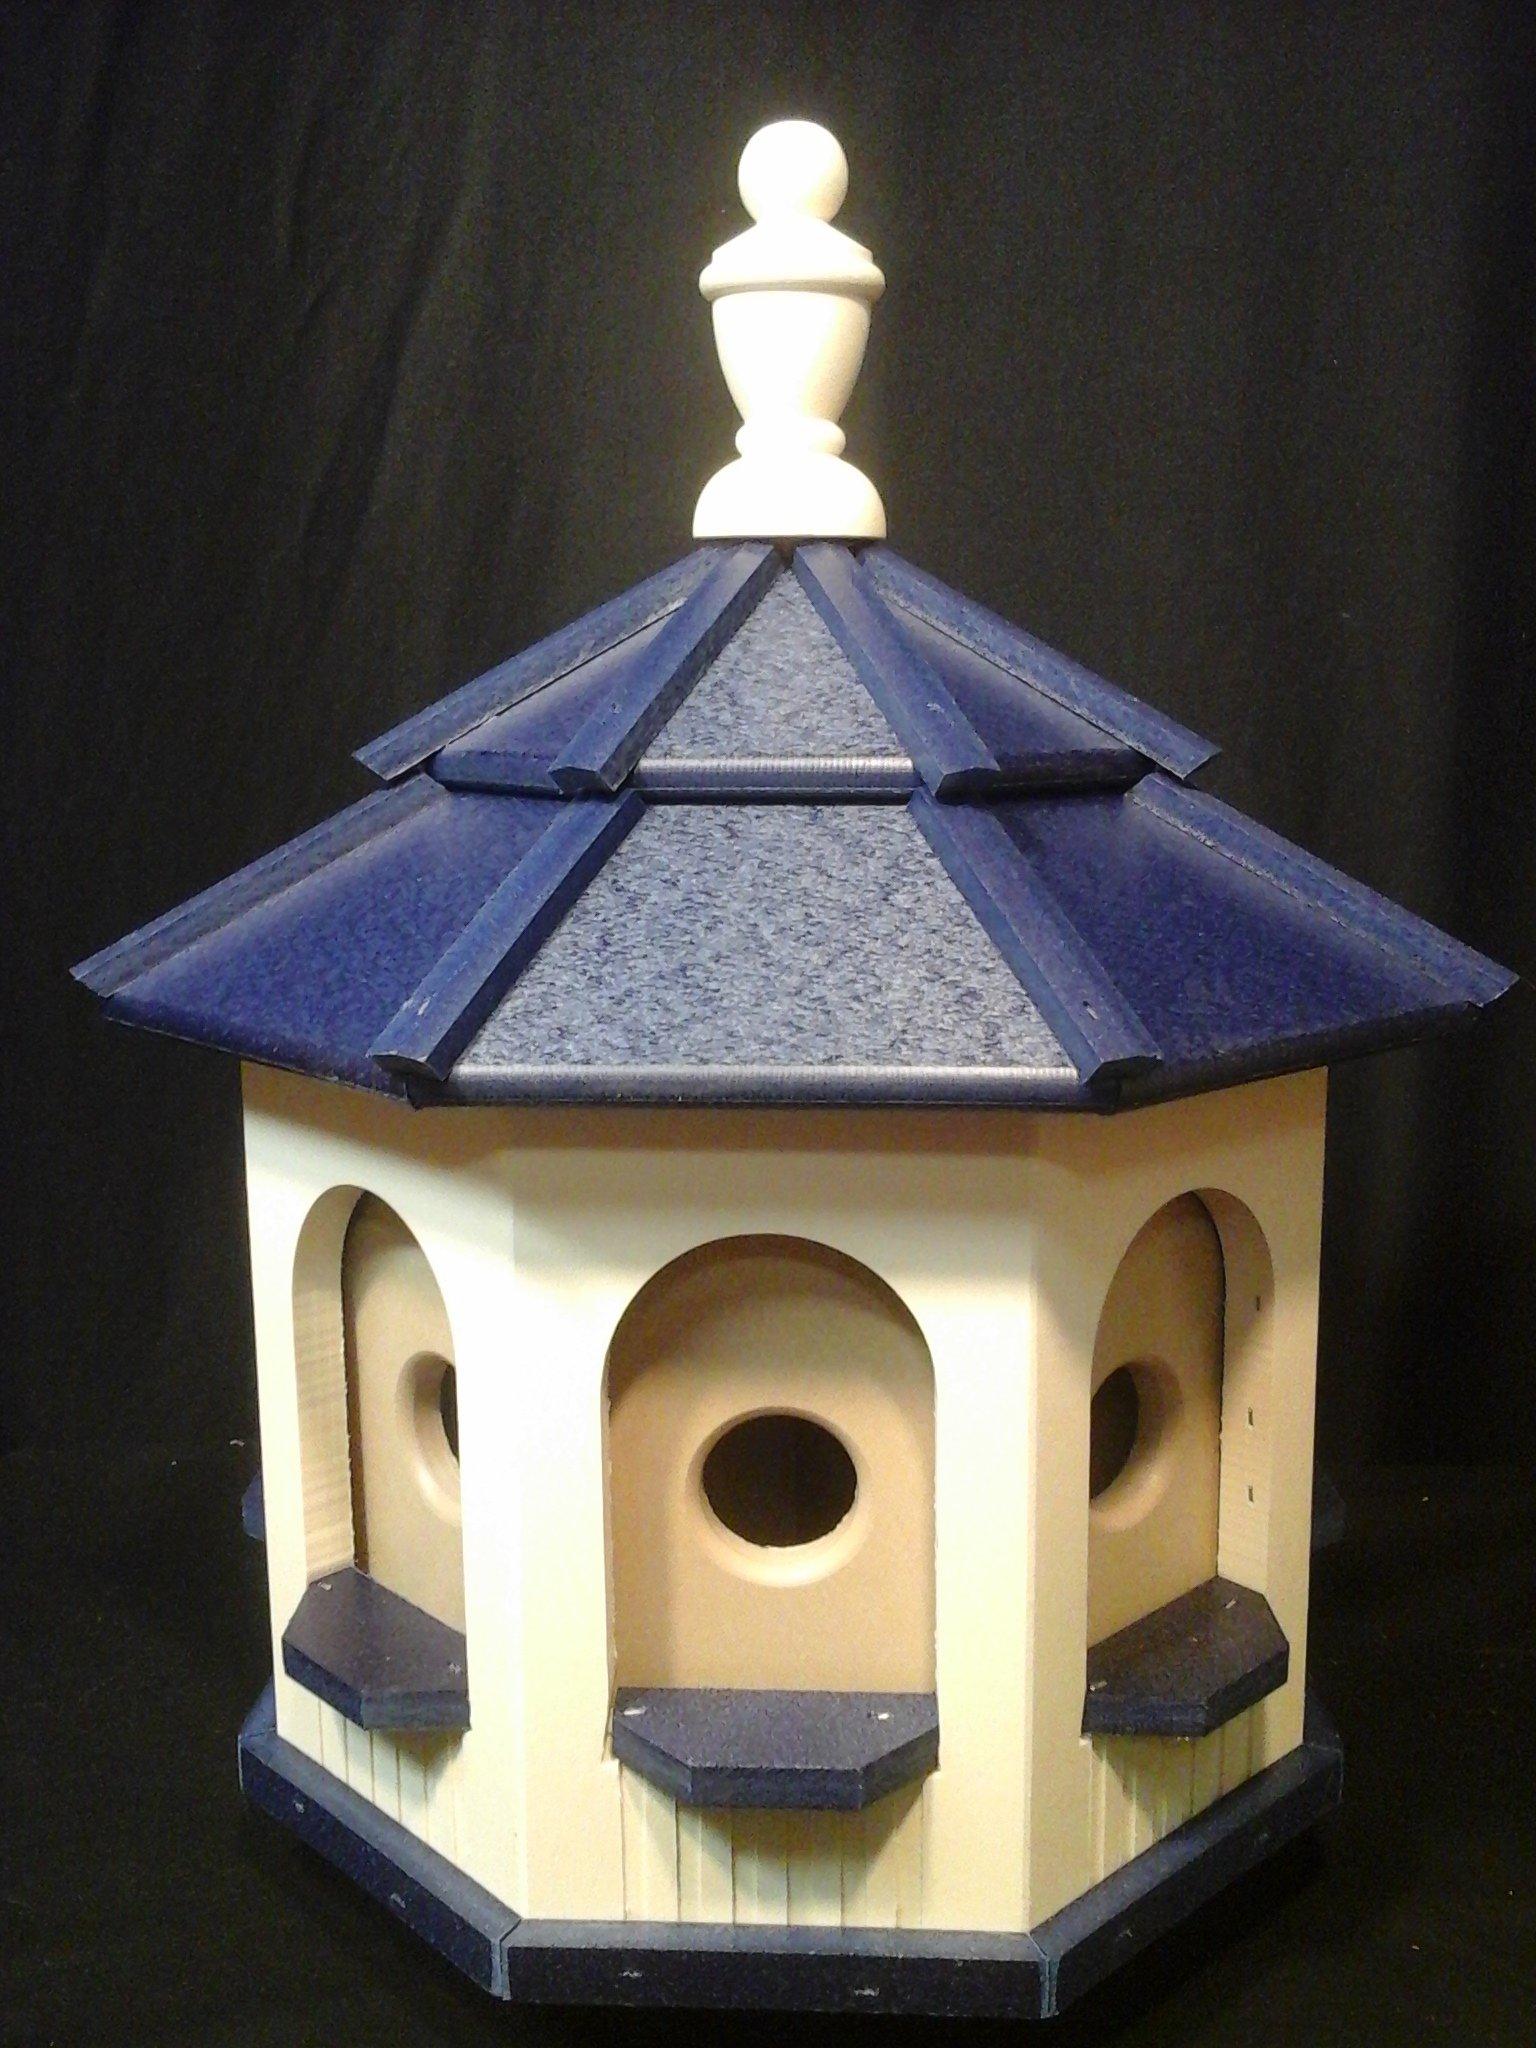 Medium Handcrafted Poly Gazebo Birdhouse Homemade Handmade Ivory & Blue Roof